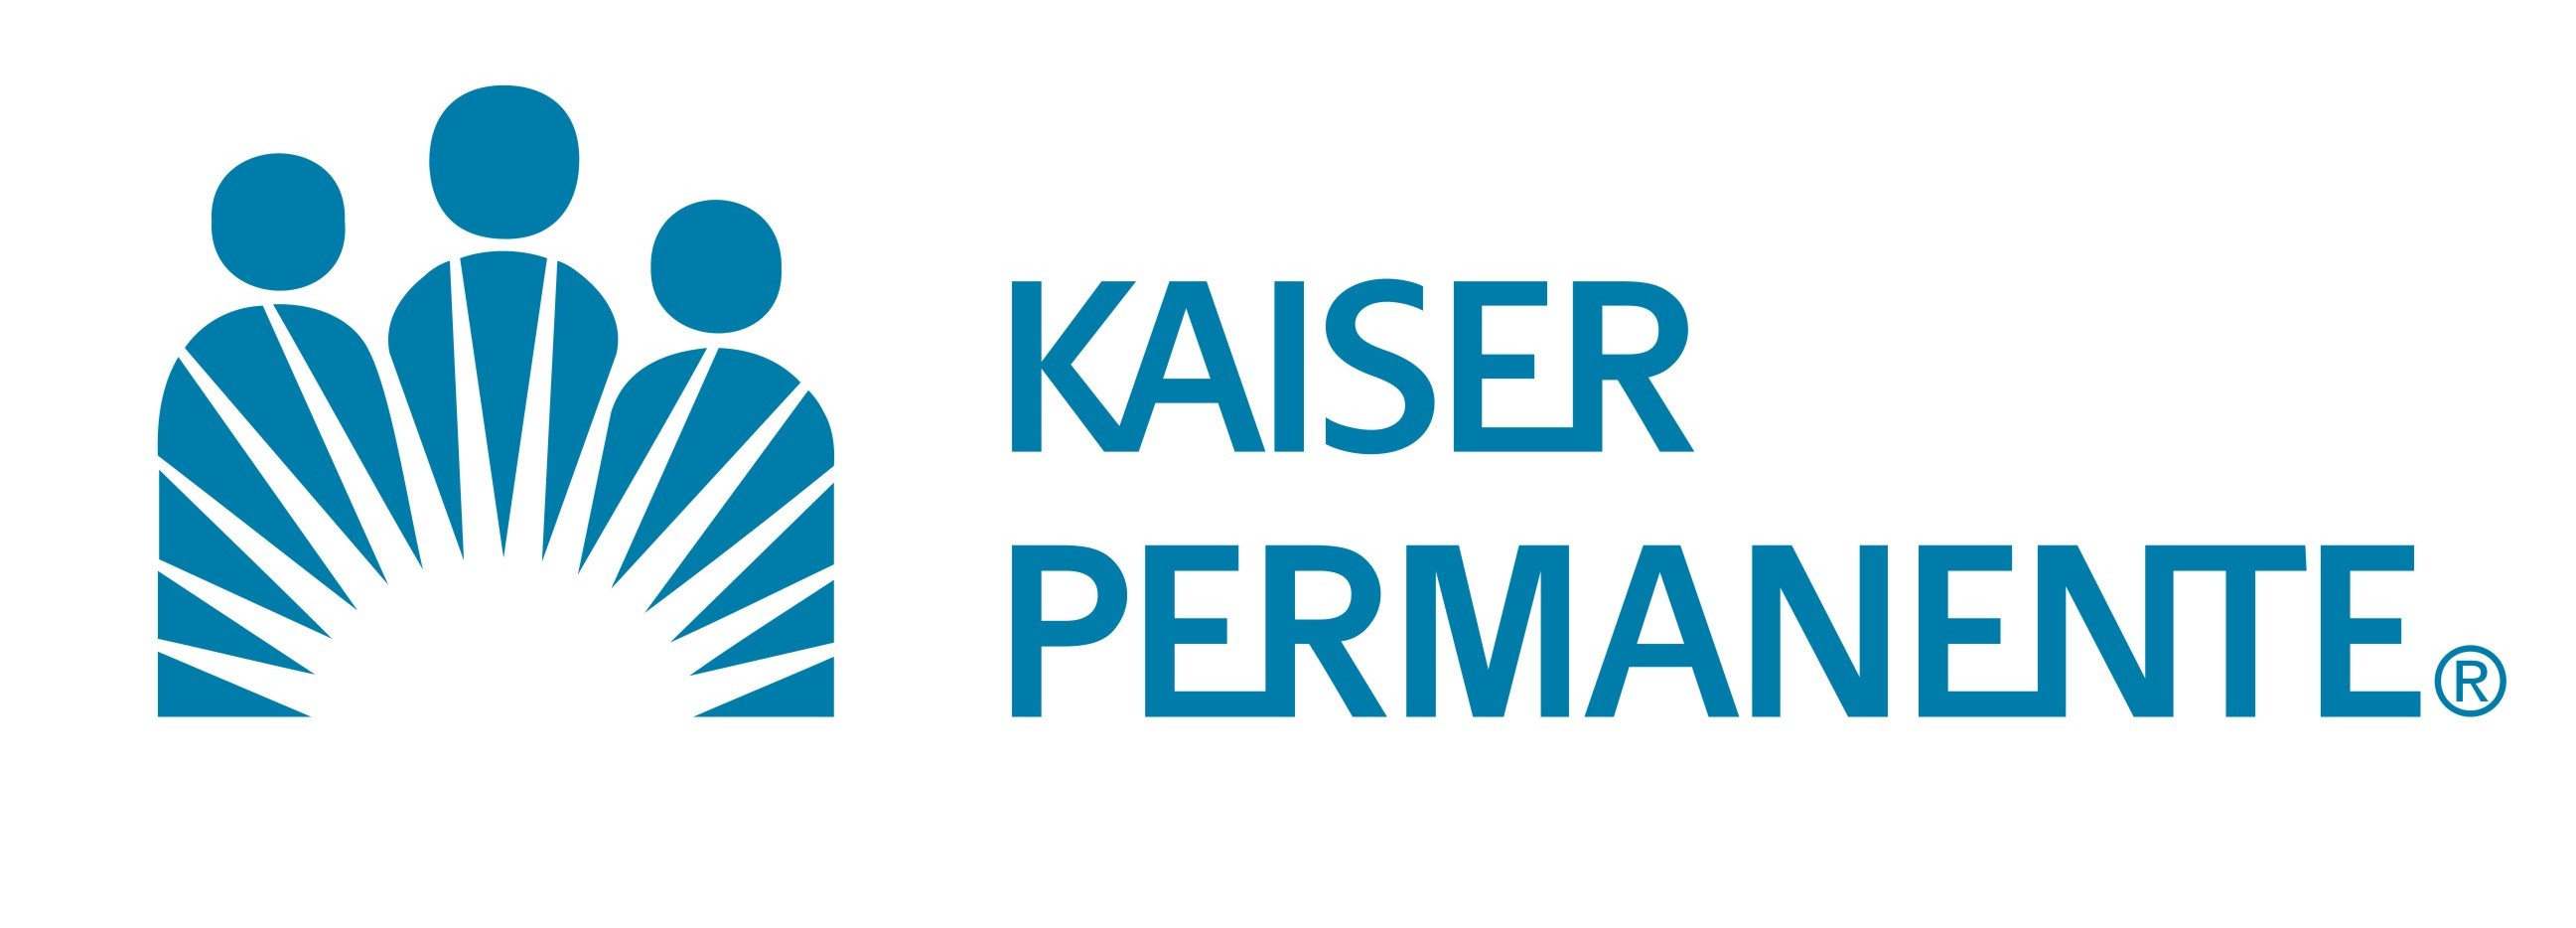 Kaiser_Permanente_rgb.jpg